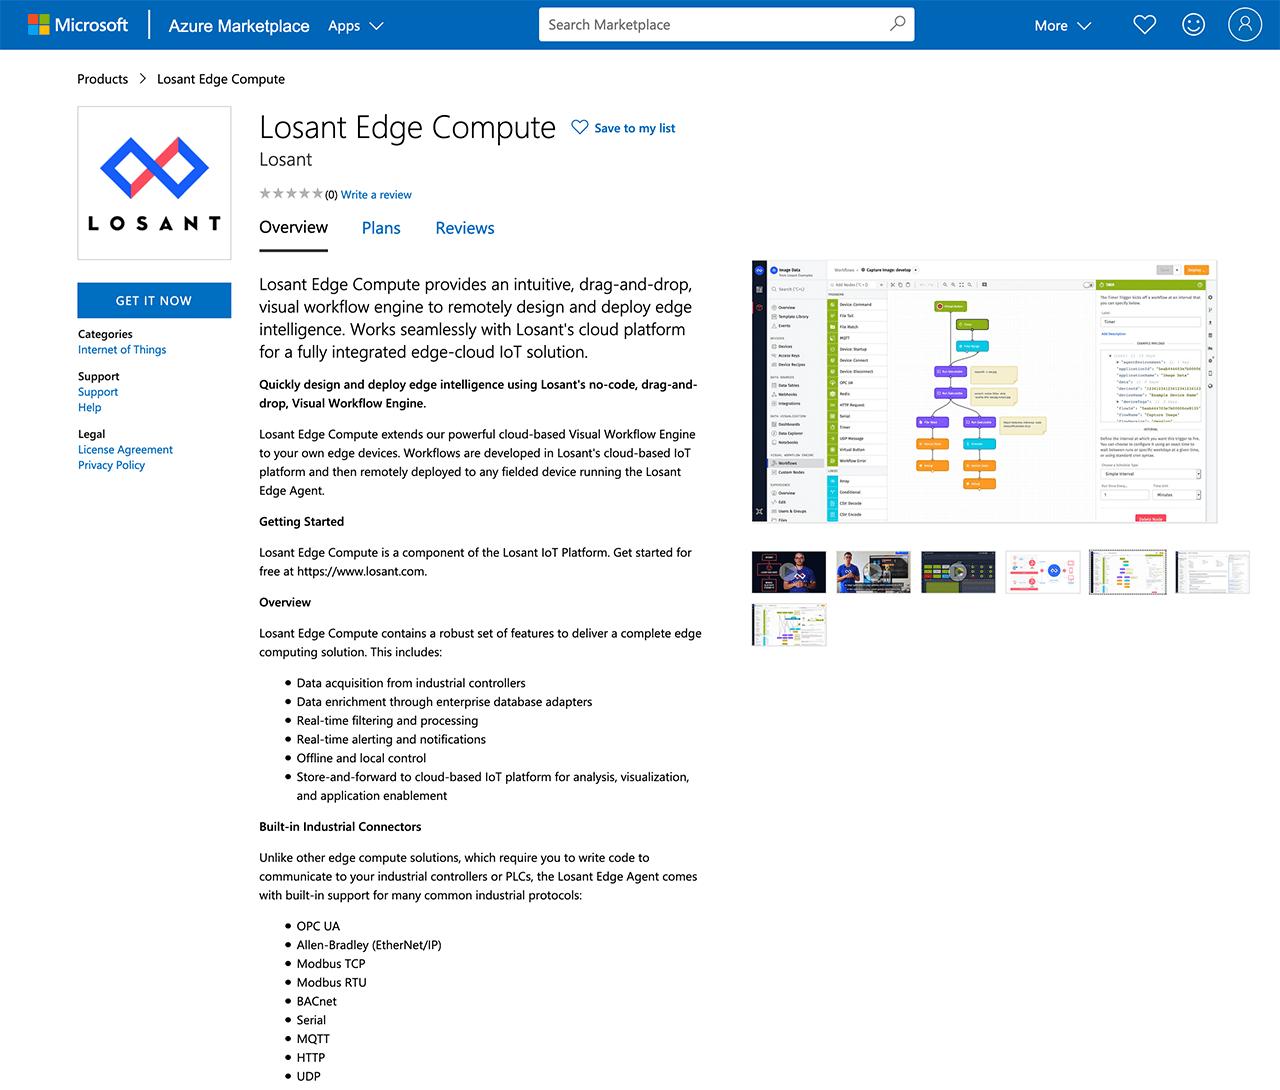 Losant Edge Compute in Azure Marketplace